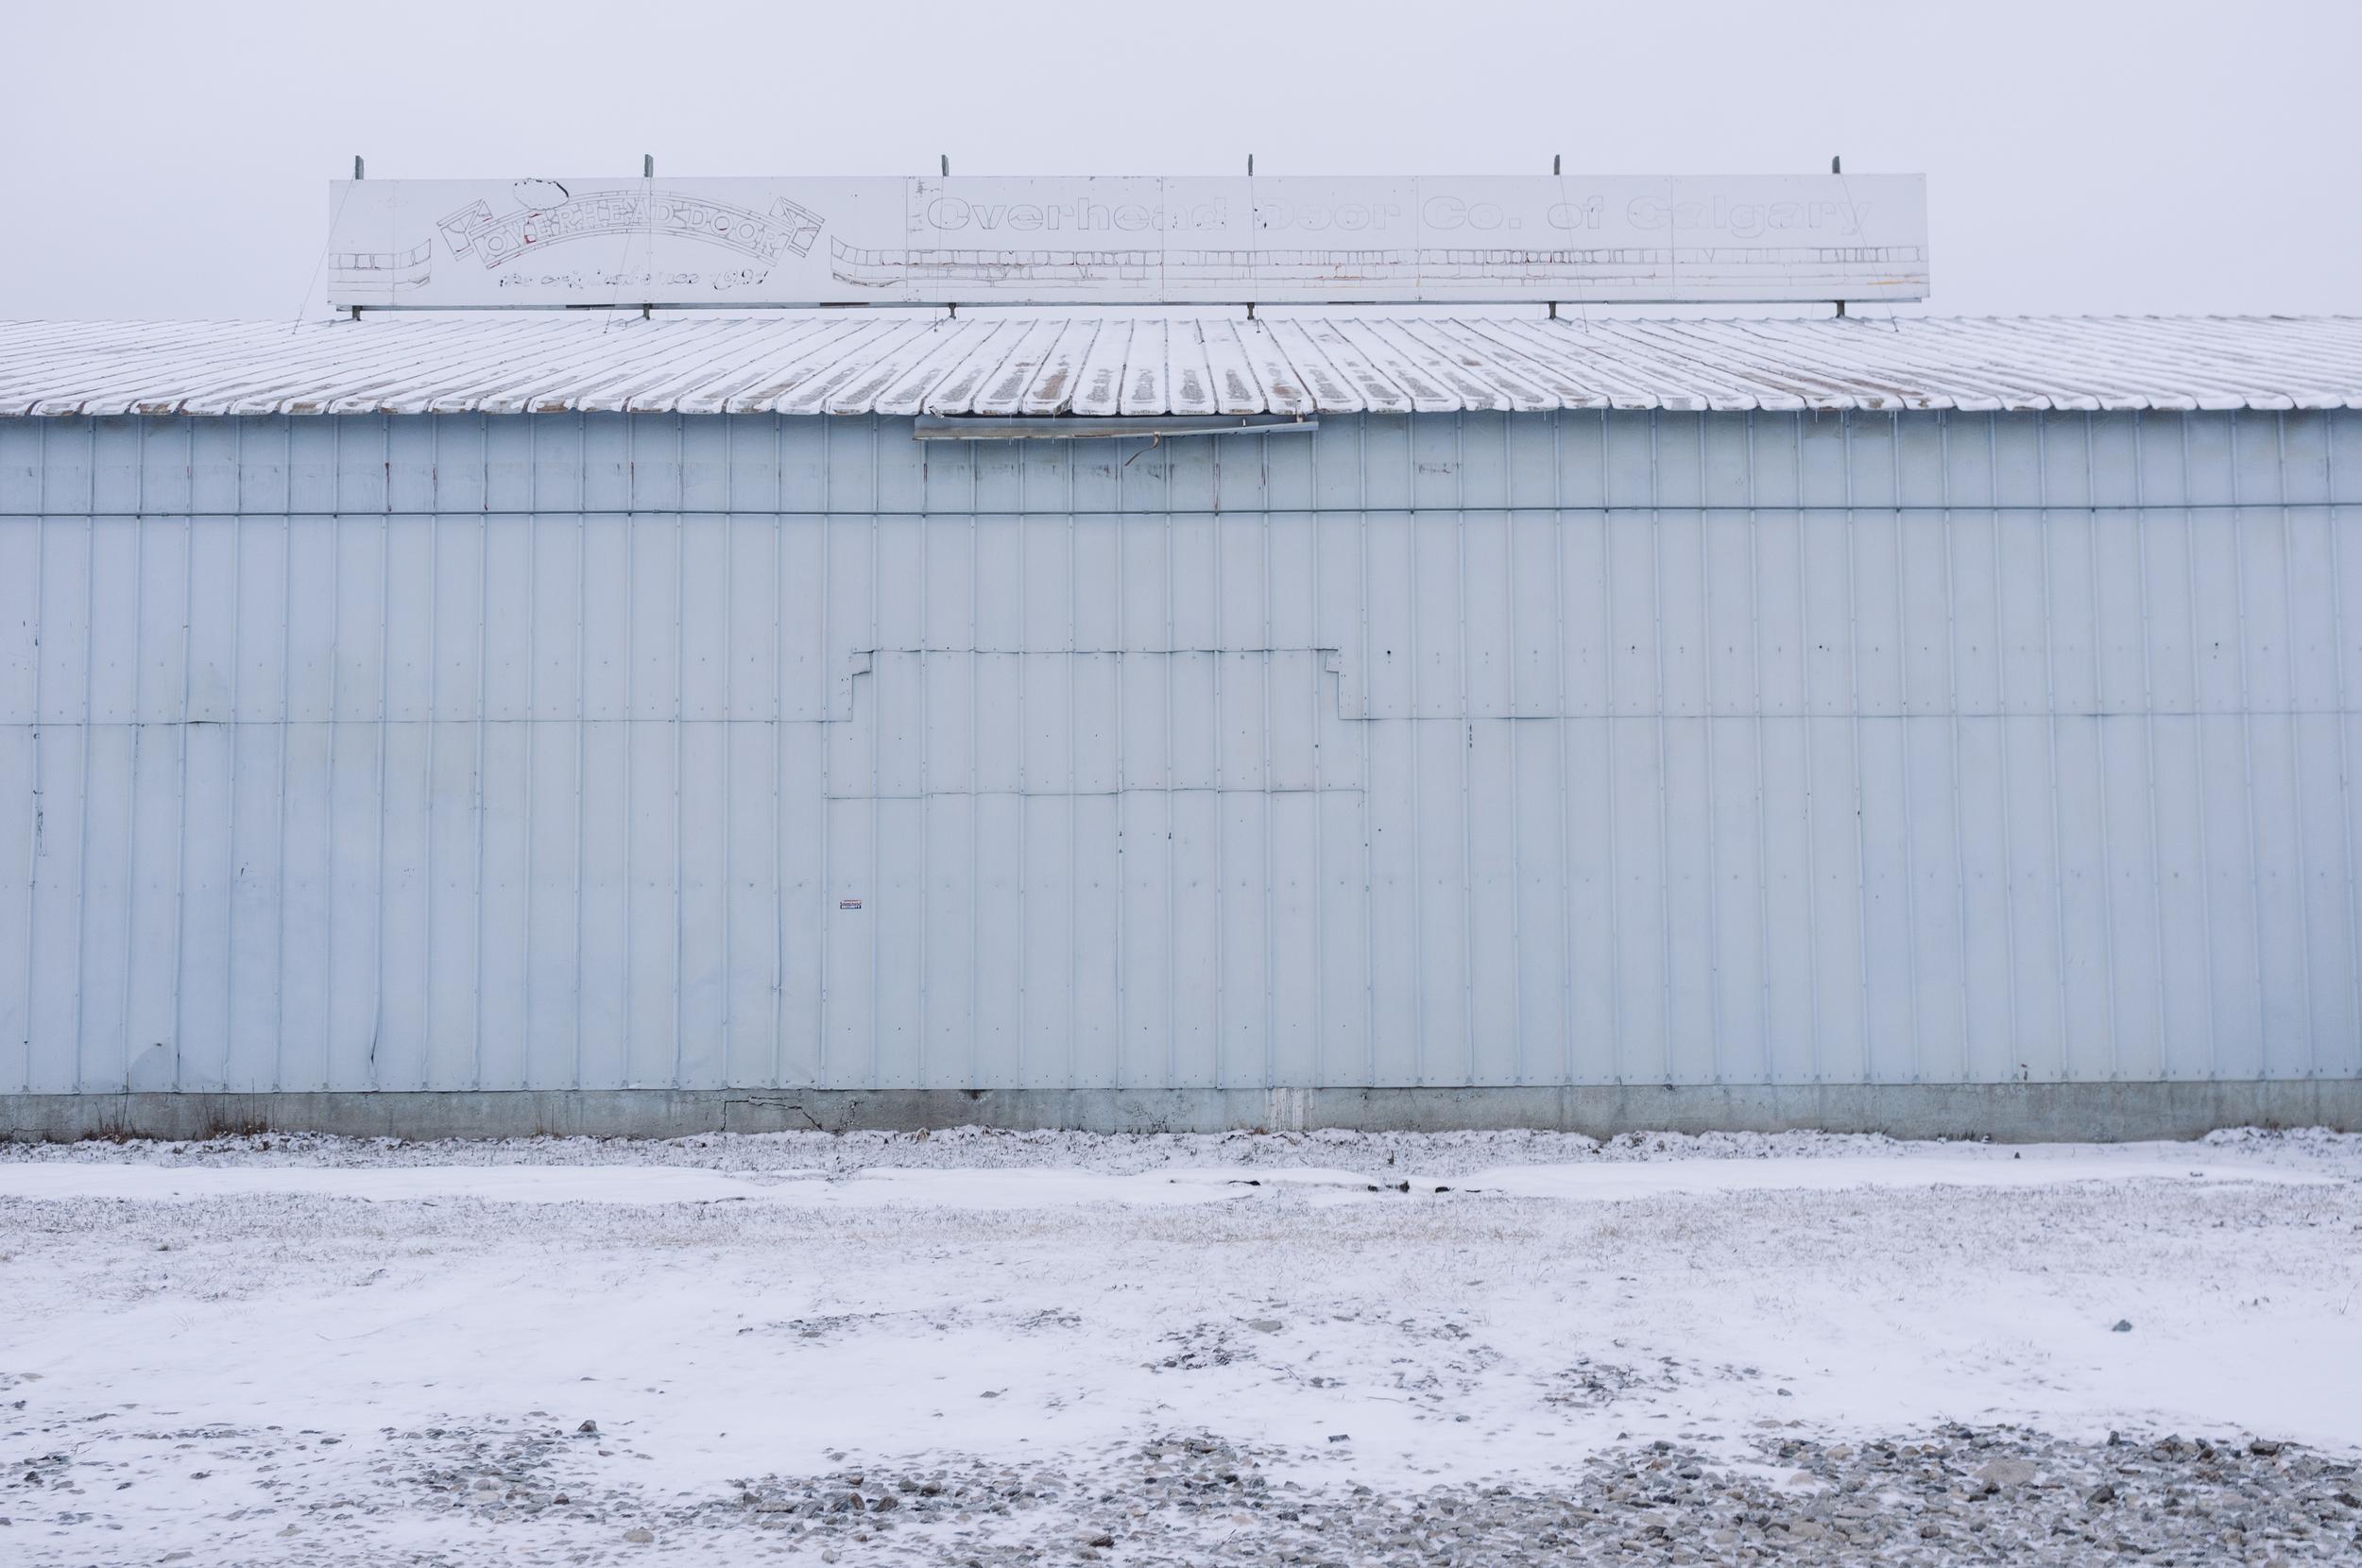 Revisiting old, favourite locations. Overhead Door. Ramsay, Calgary, Alberta, 2013.